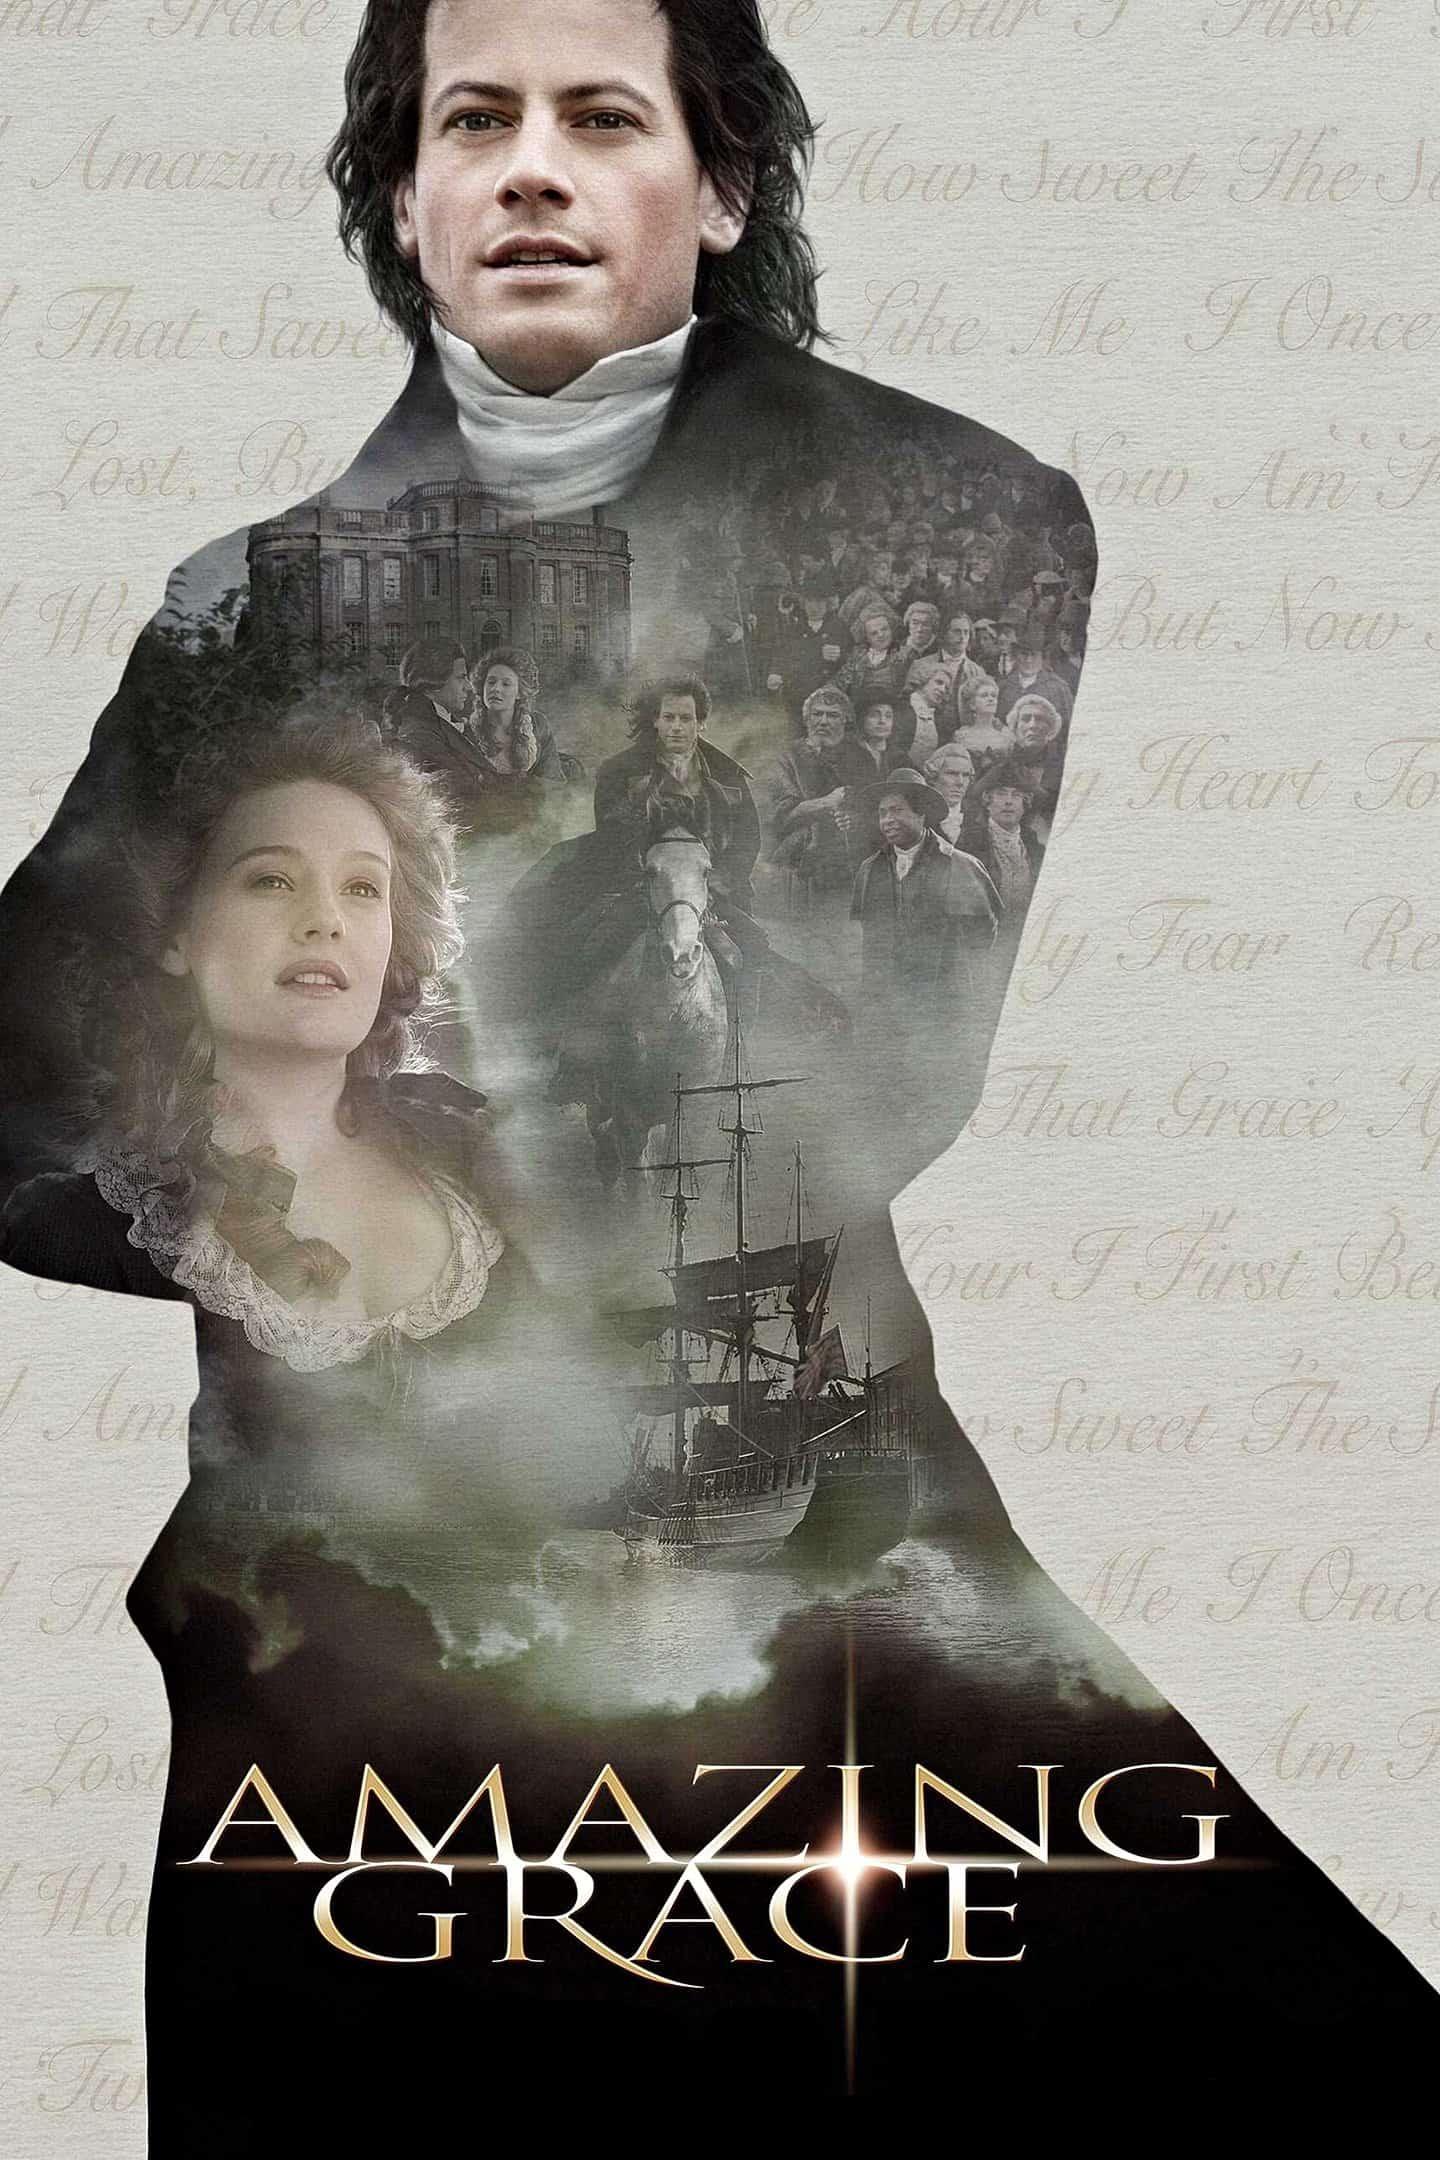 Amazing Grace, 2006